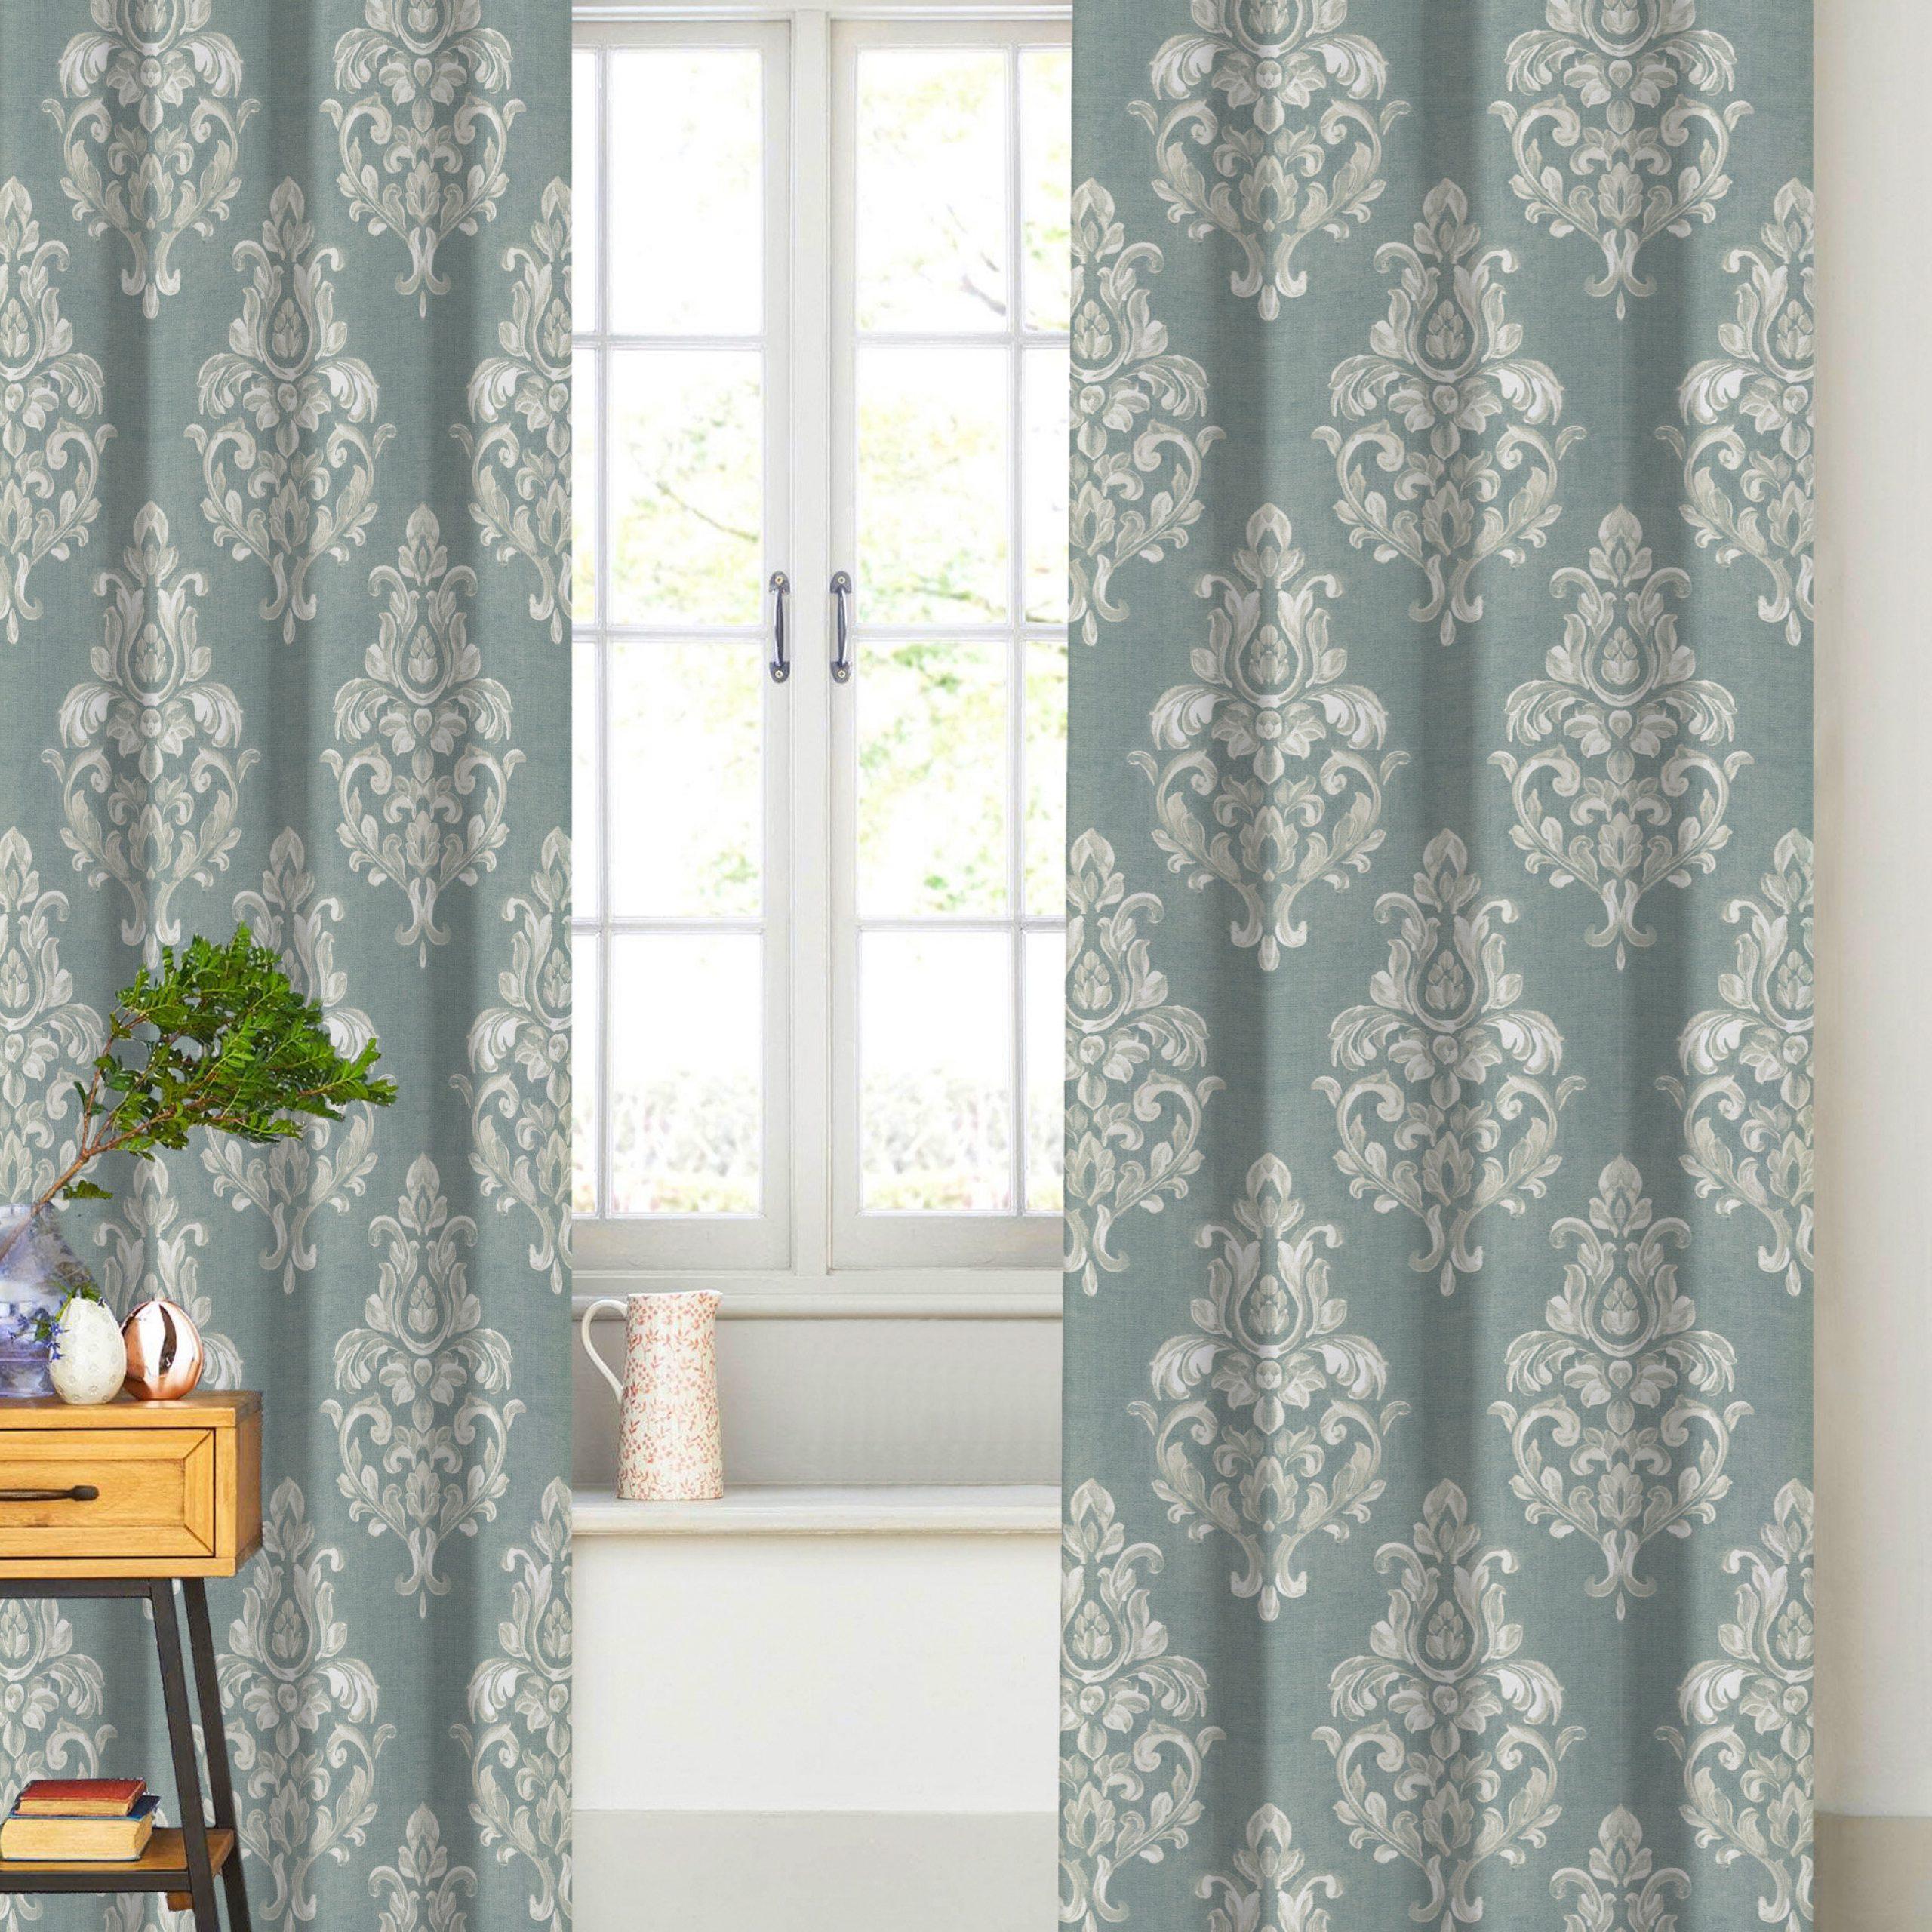 2021 Canora Grey Shoemaker Damask Semi Sheer Curtain Panels (View 18 of 20)